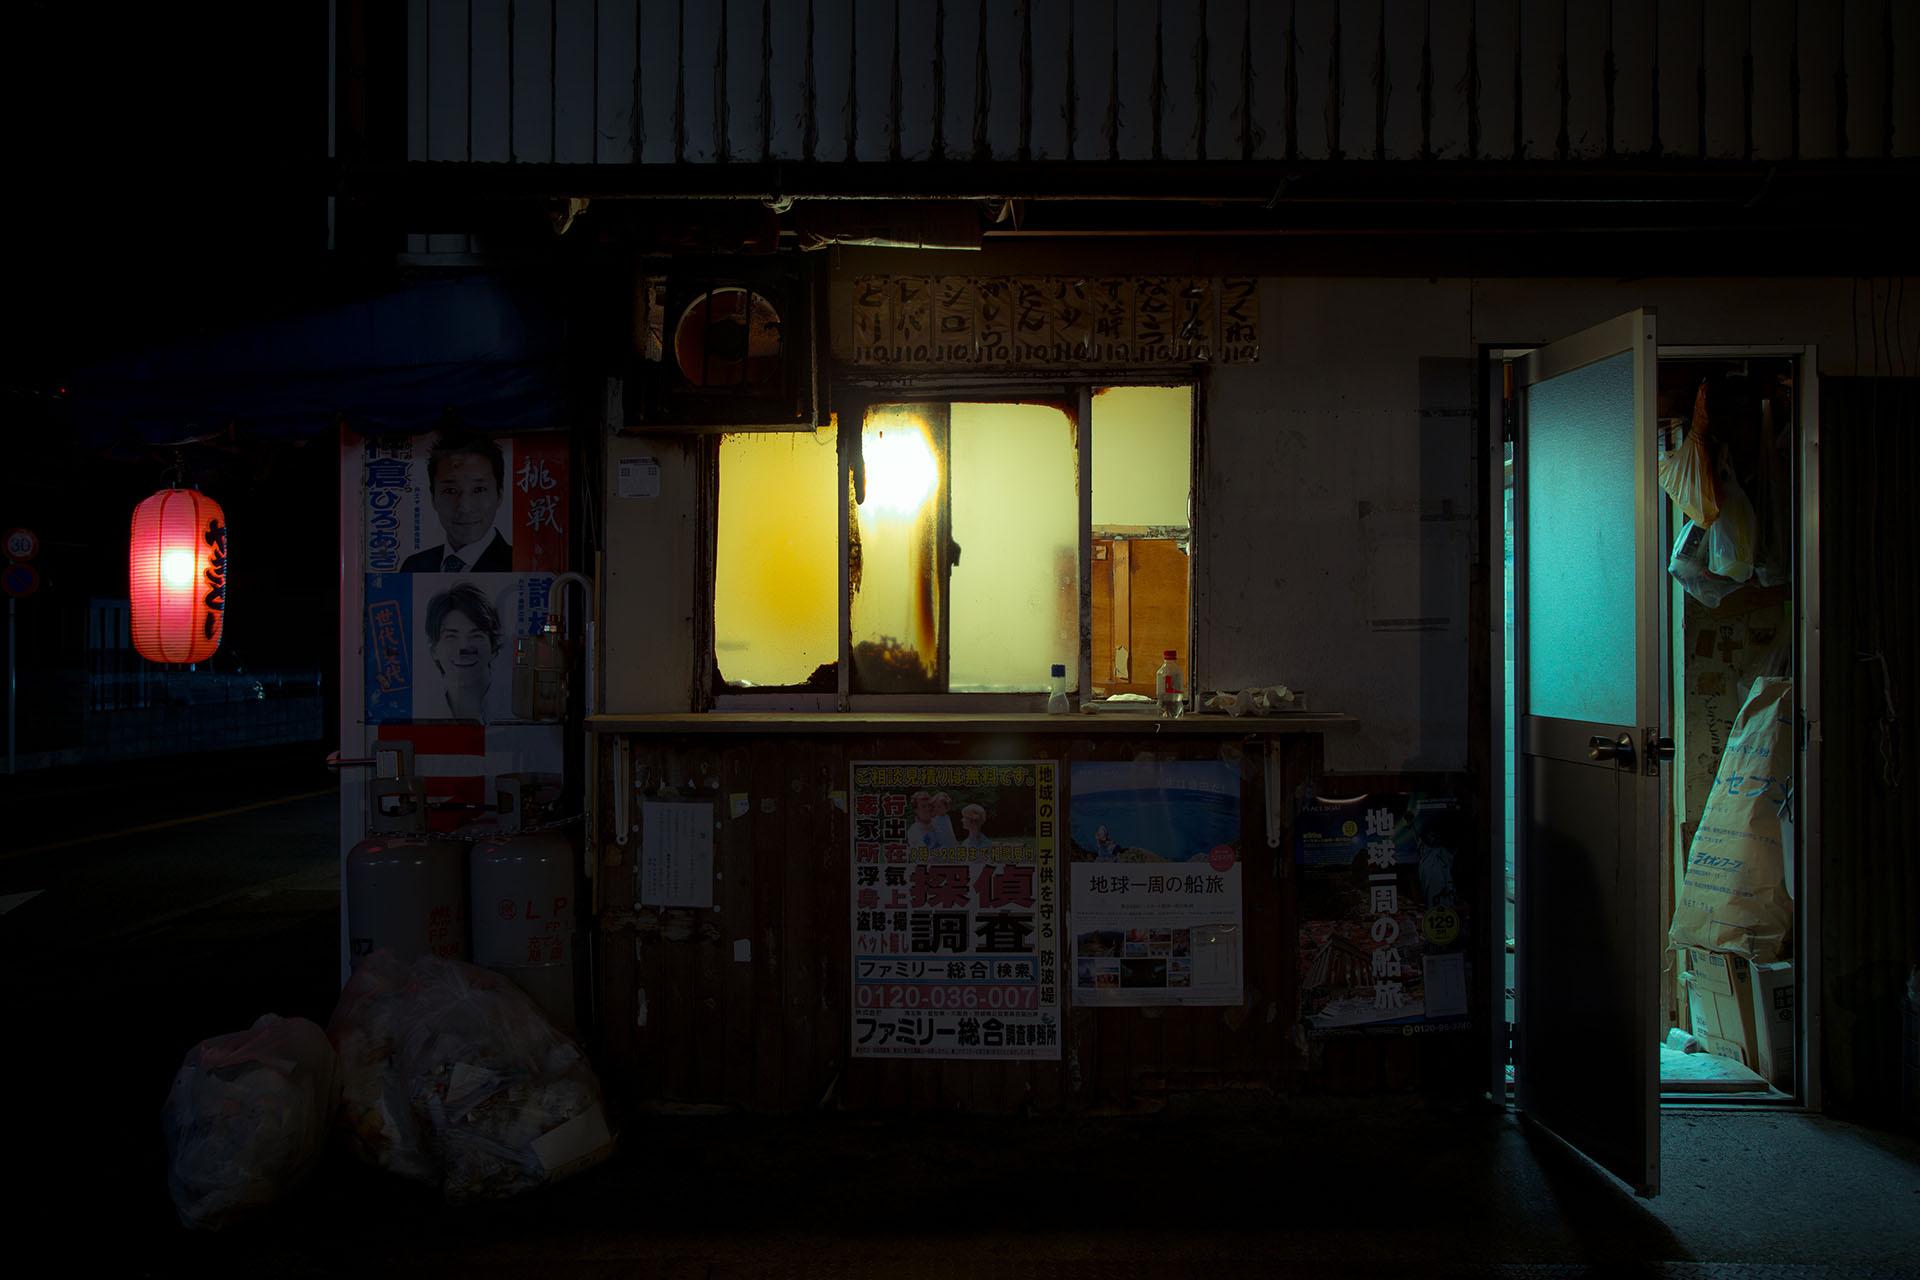 shibusawa-4.jpg